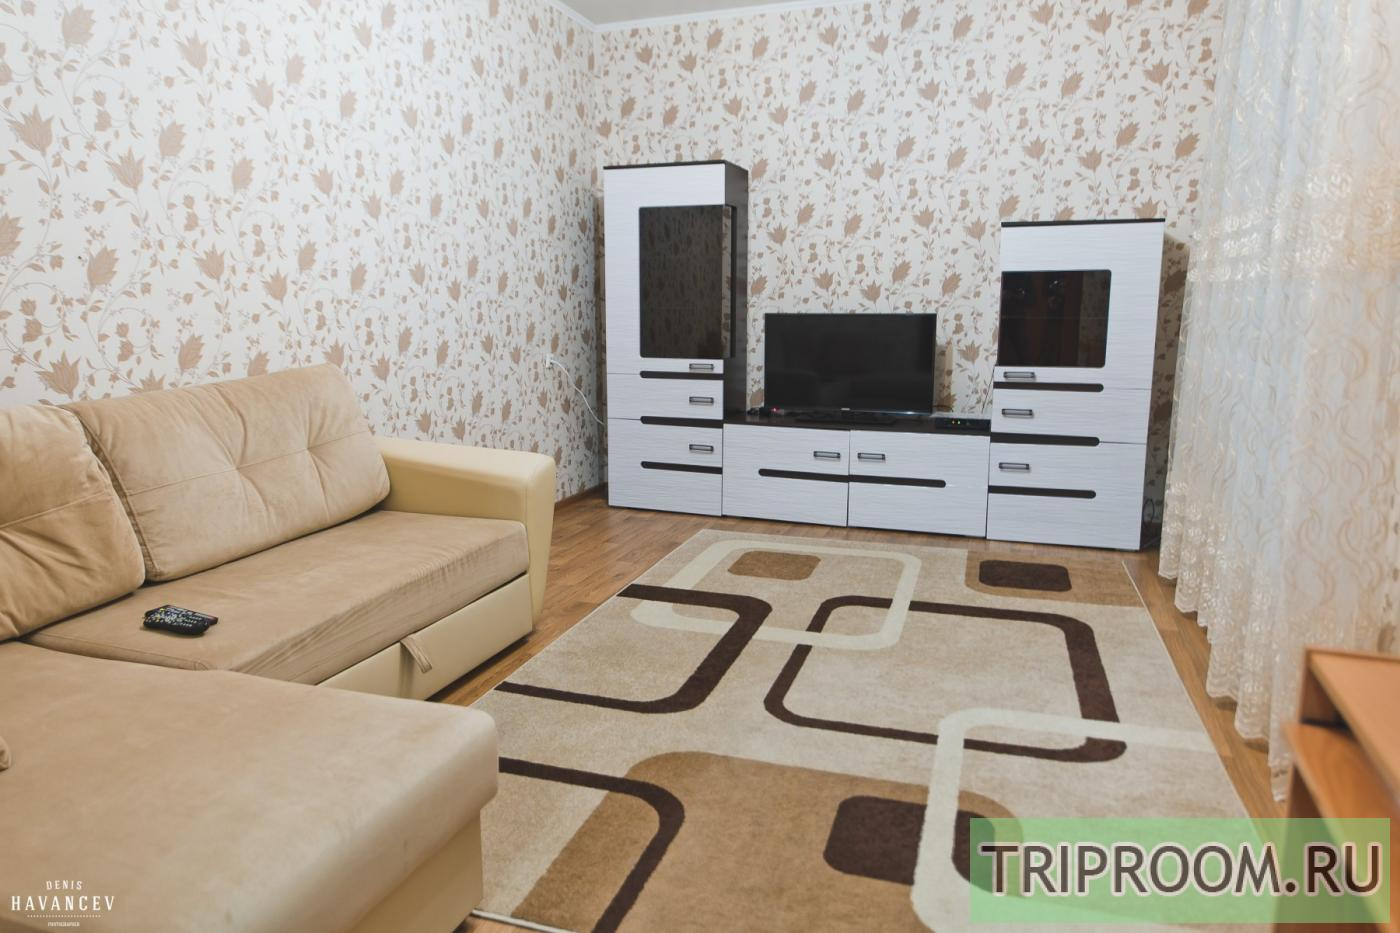 1-комнатная квартира посуточно (вариант № 14832), ул. Пугачева улица, фото № 6